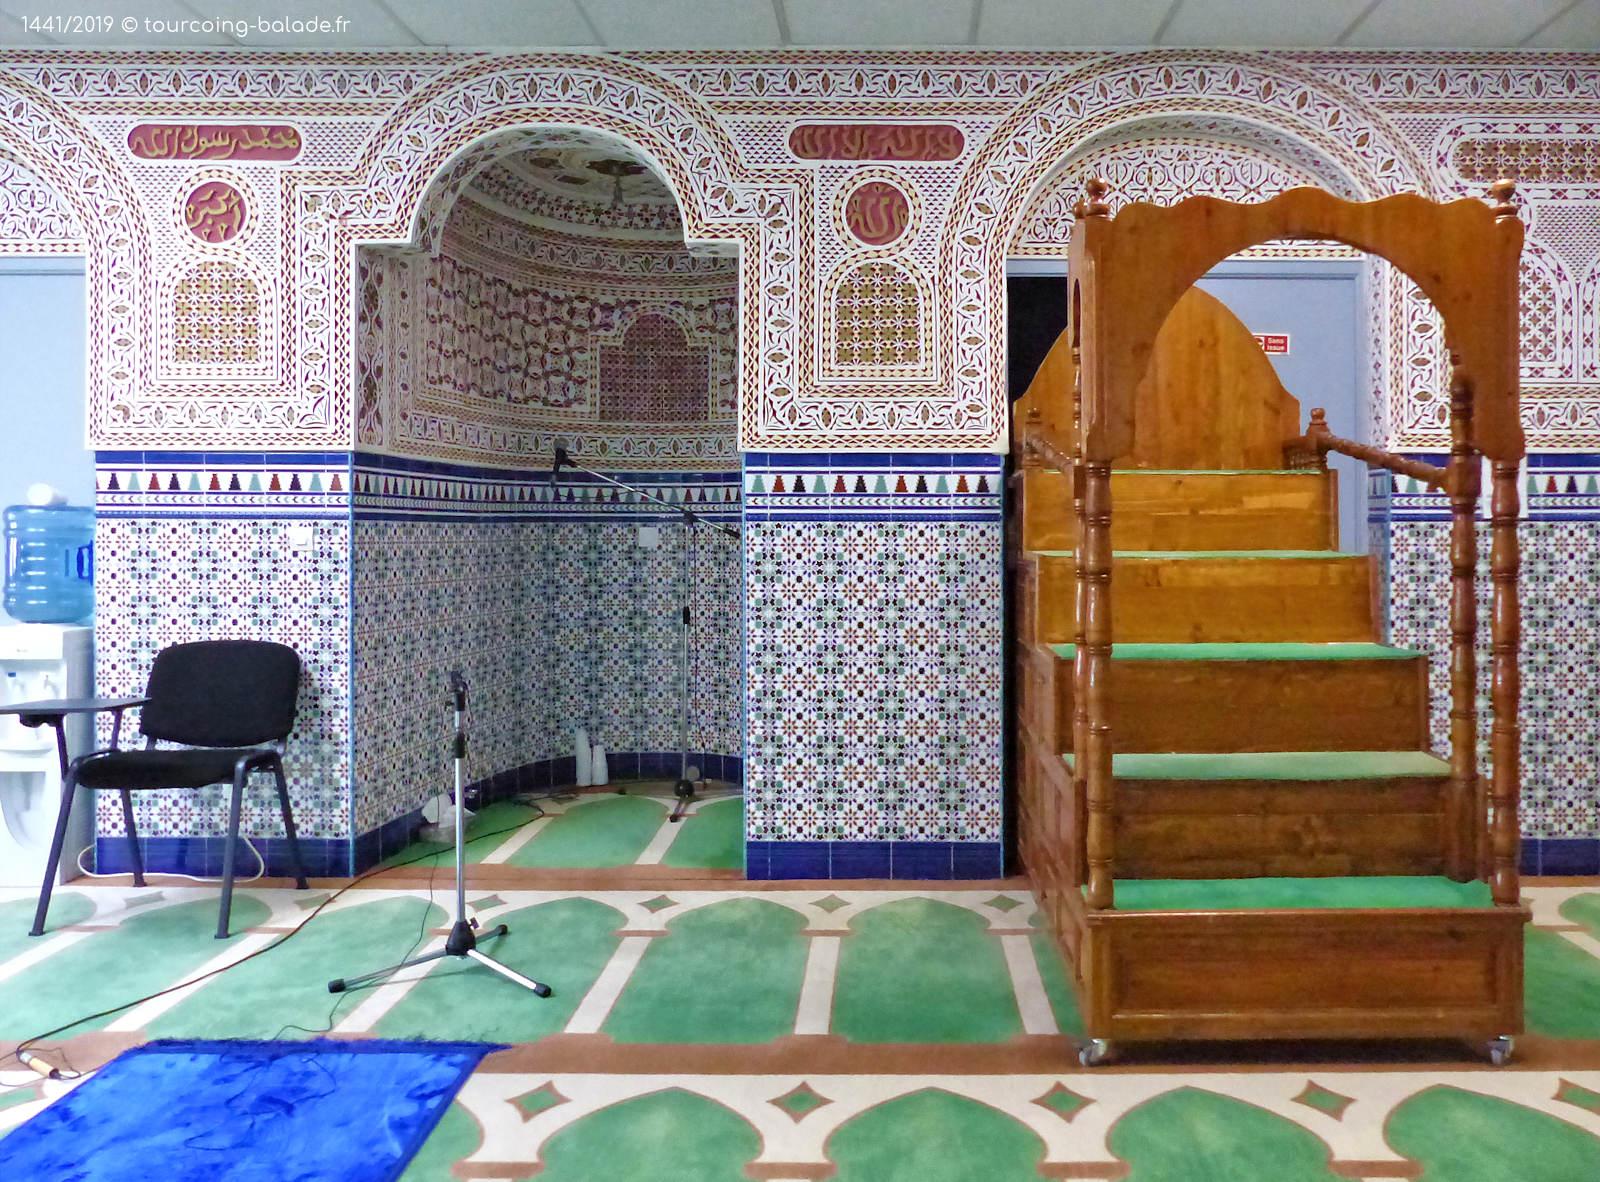 Croix-Rouge Cours Piats Tourcoing 2020 - Mosquée Assalam